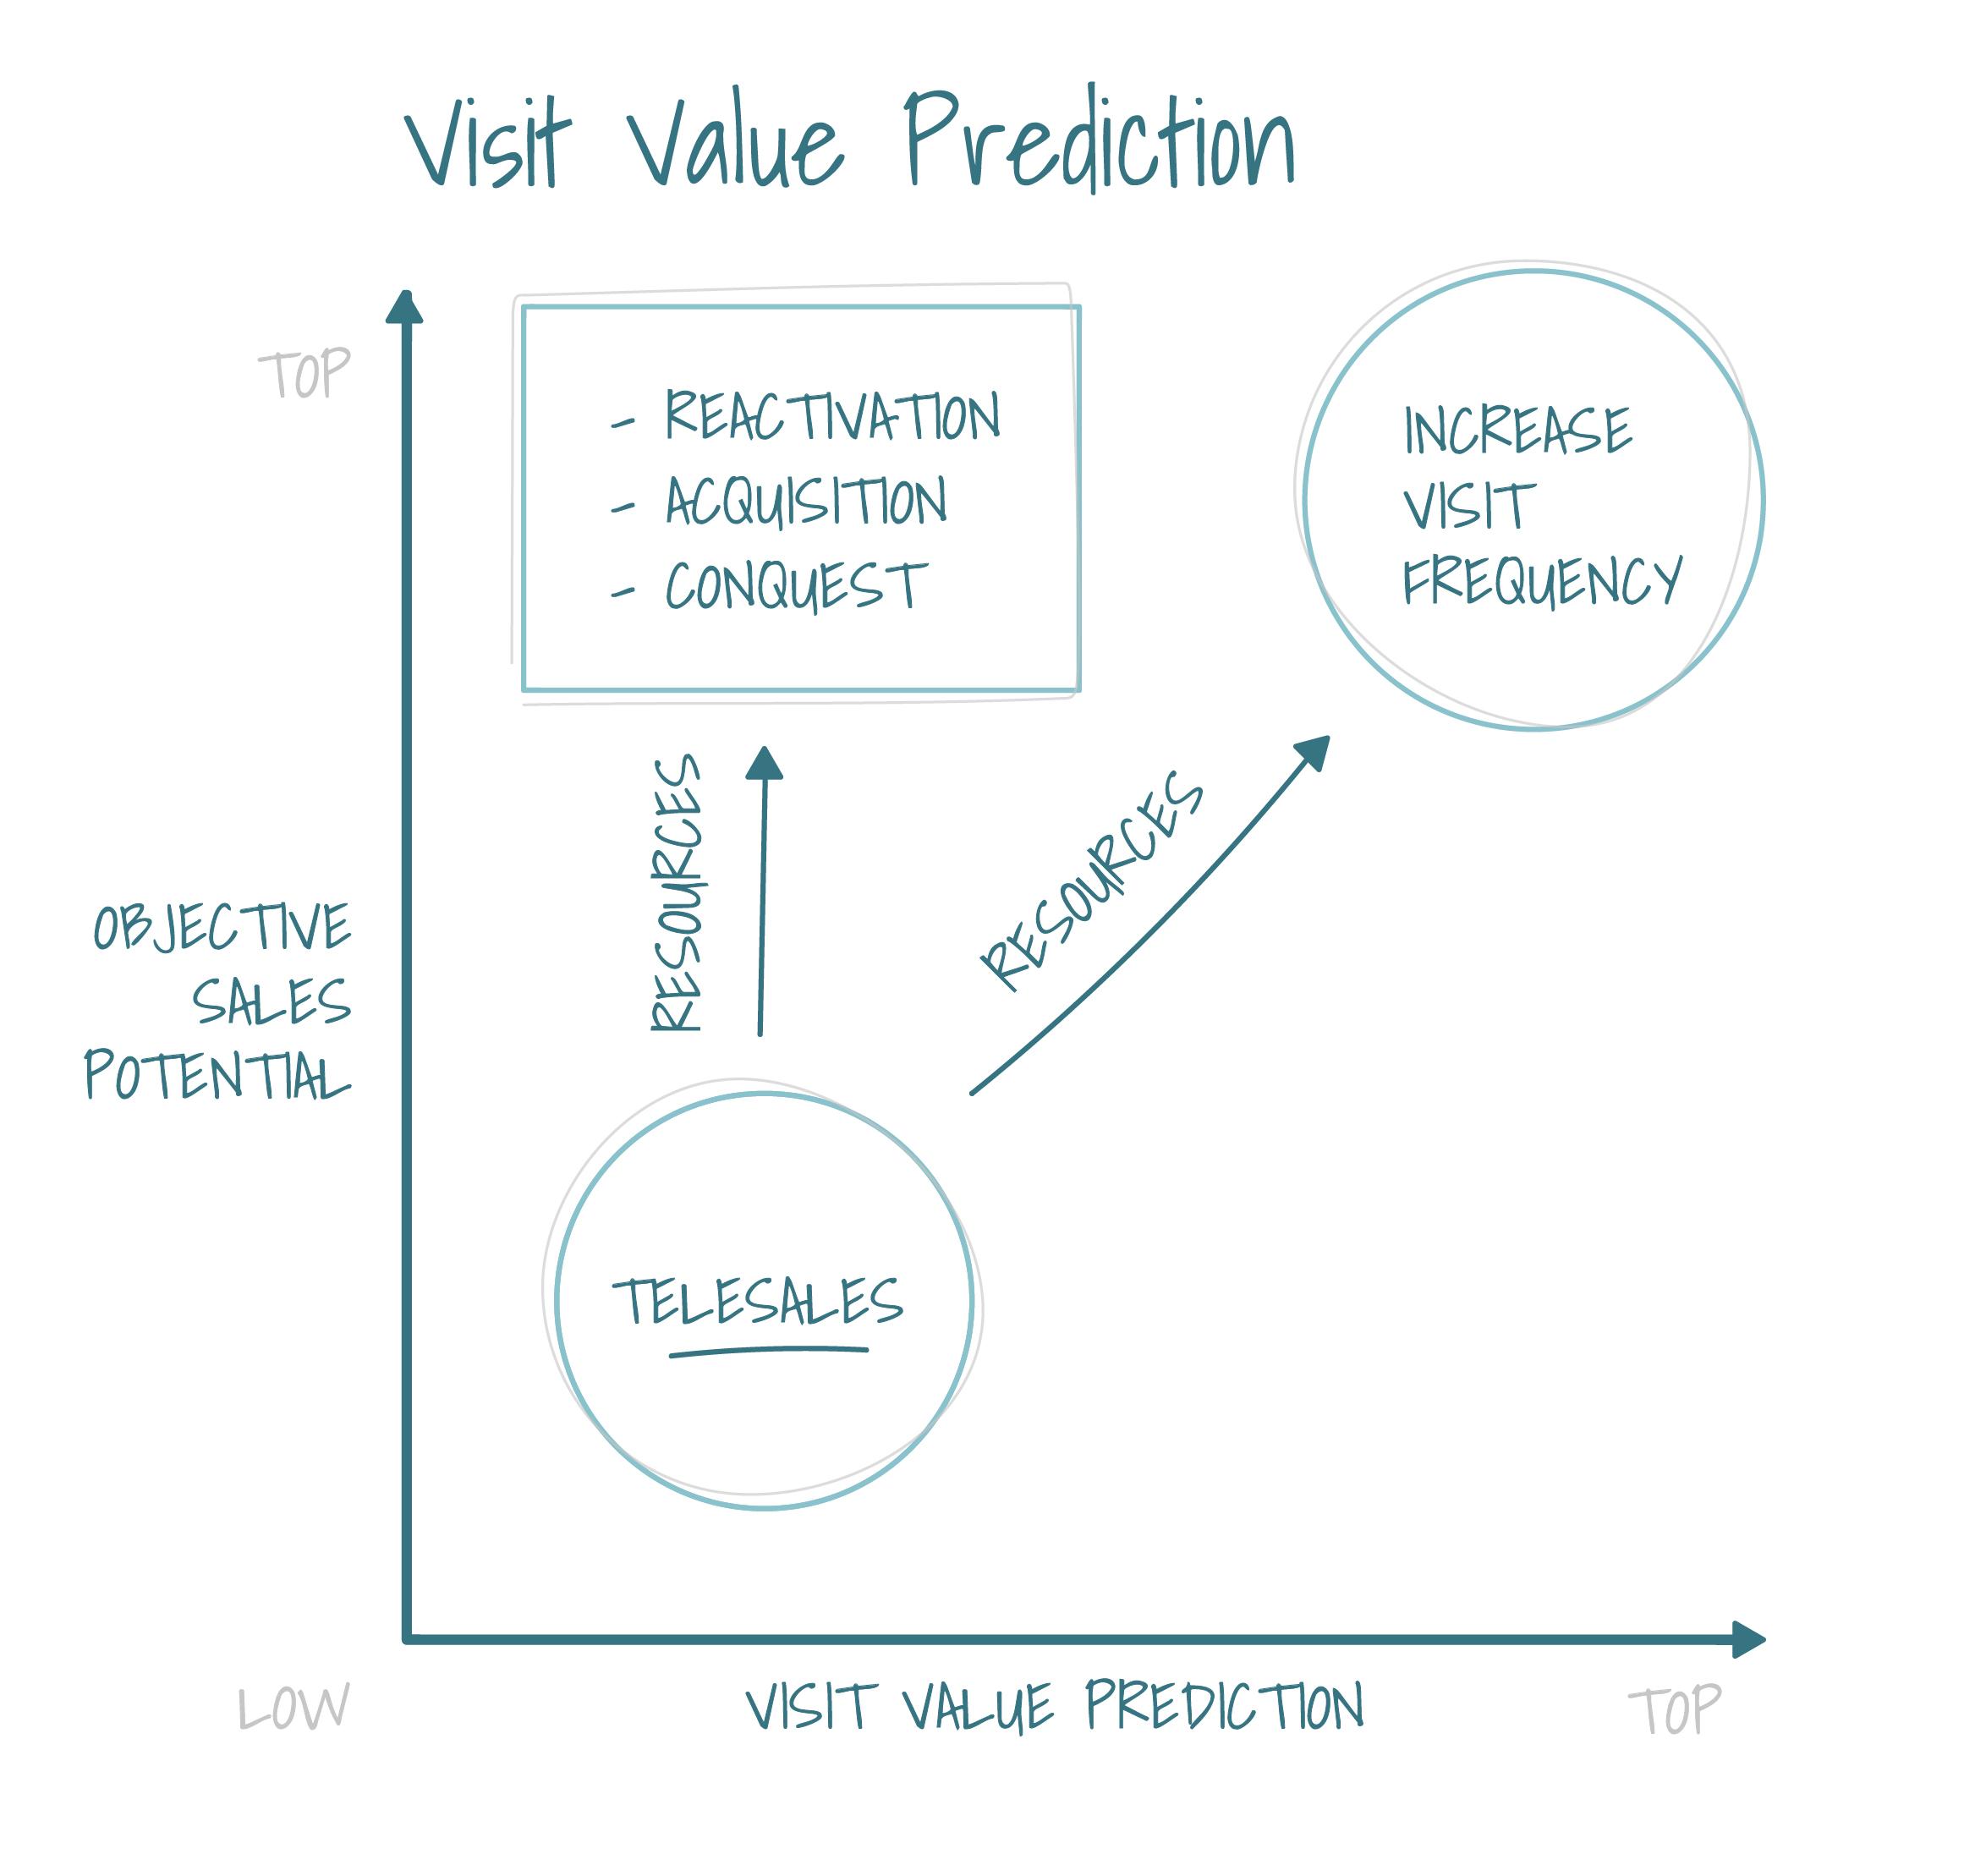 Visit Value Prediction